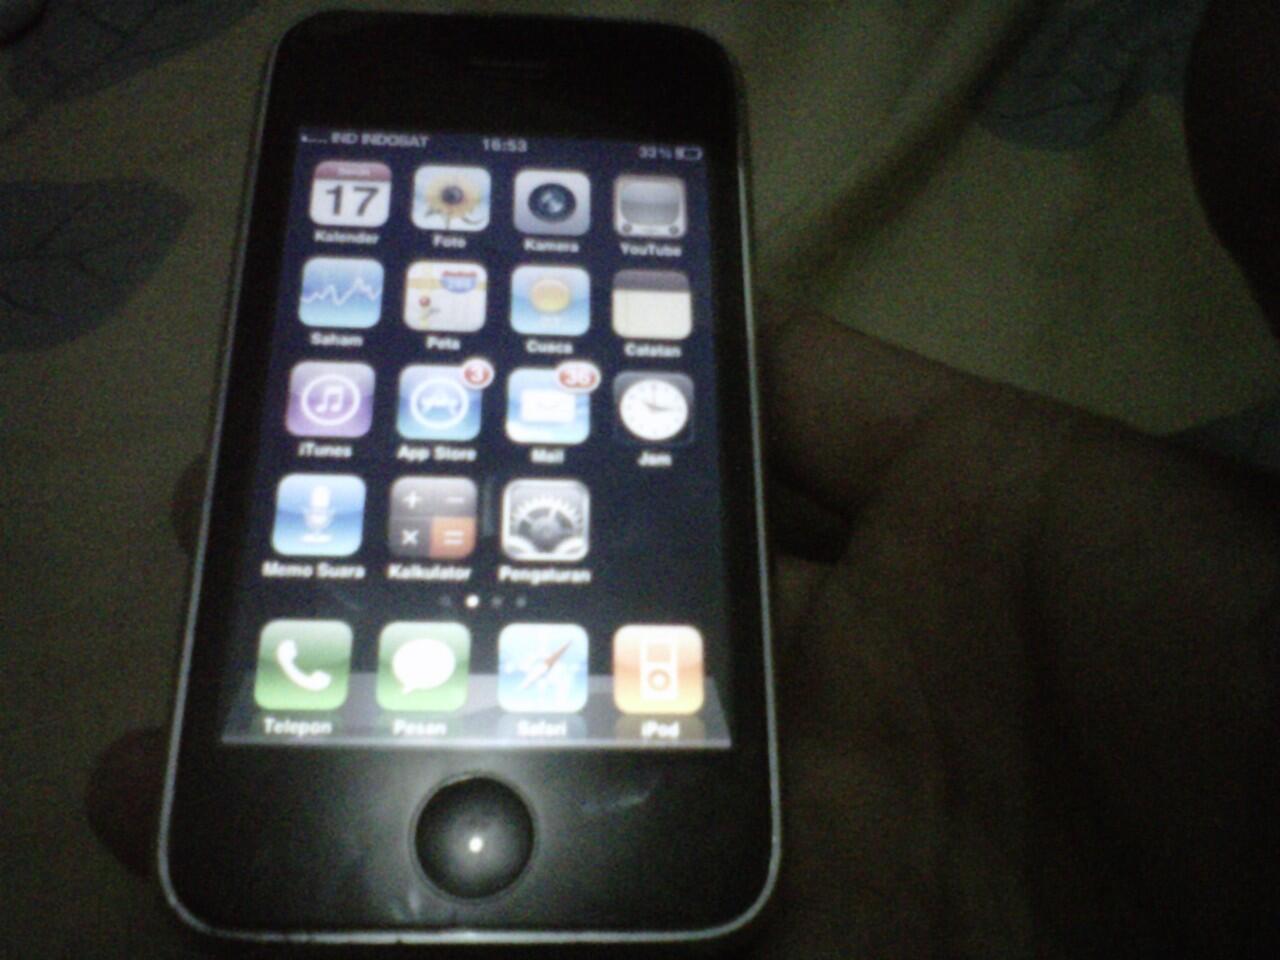 iphone 3g 8gb batangan